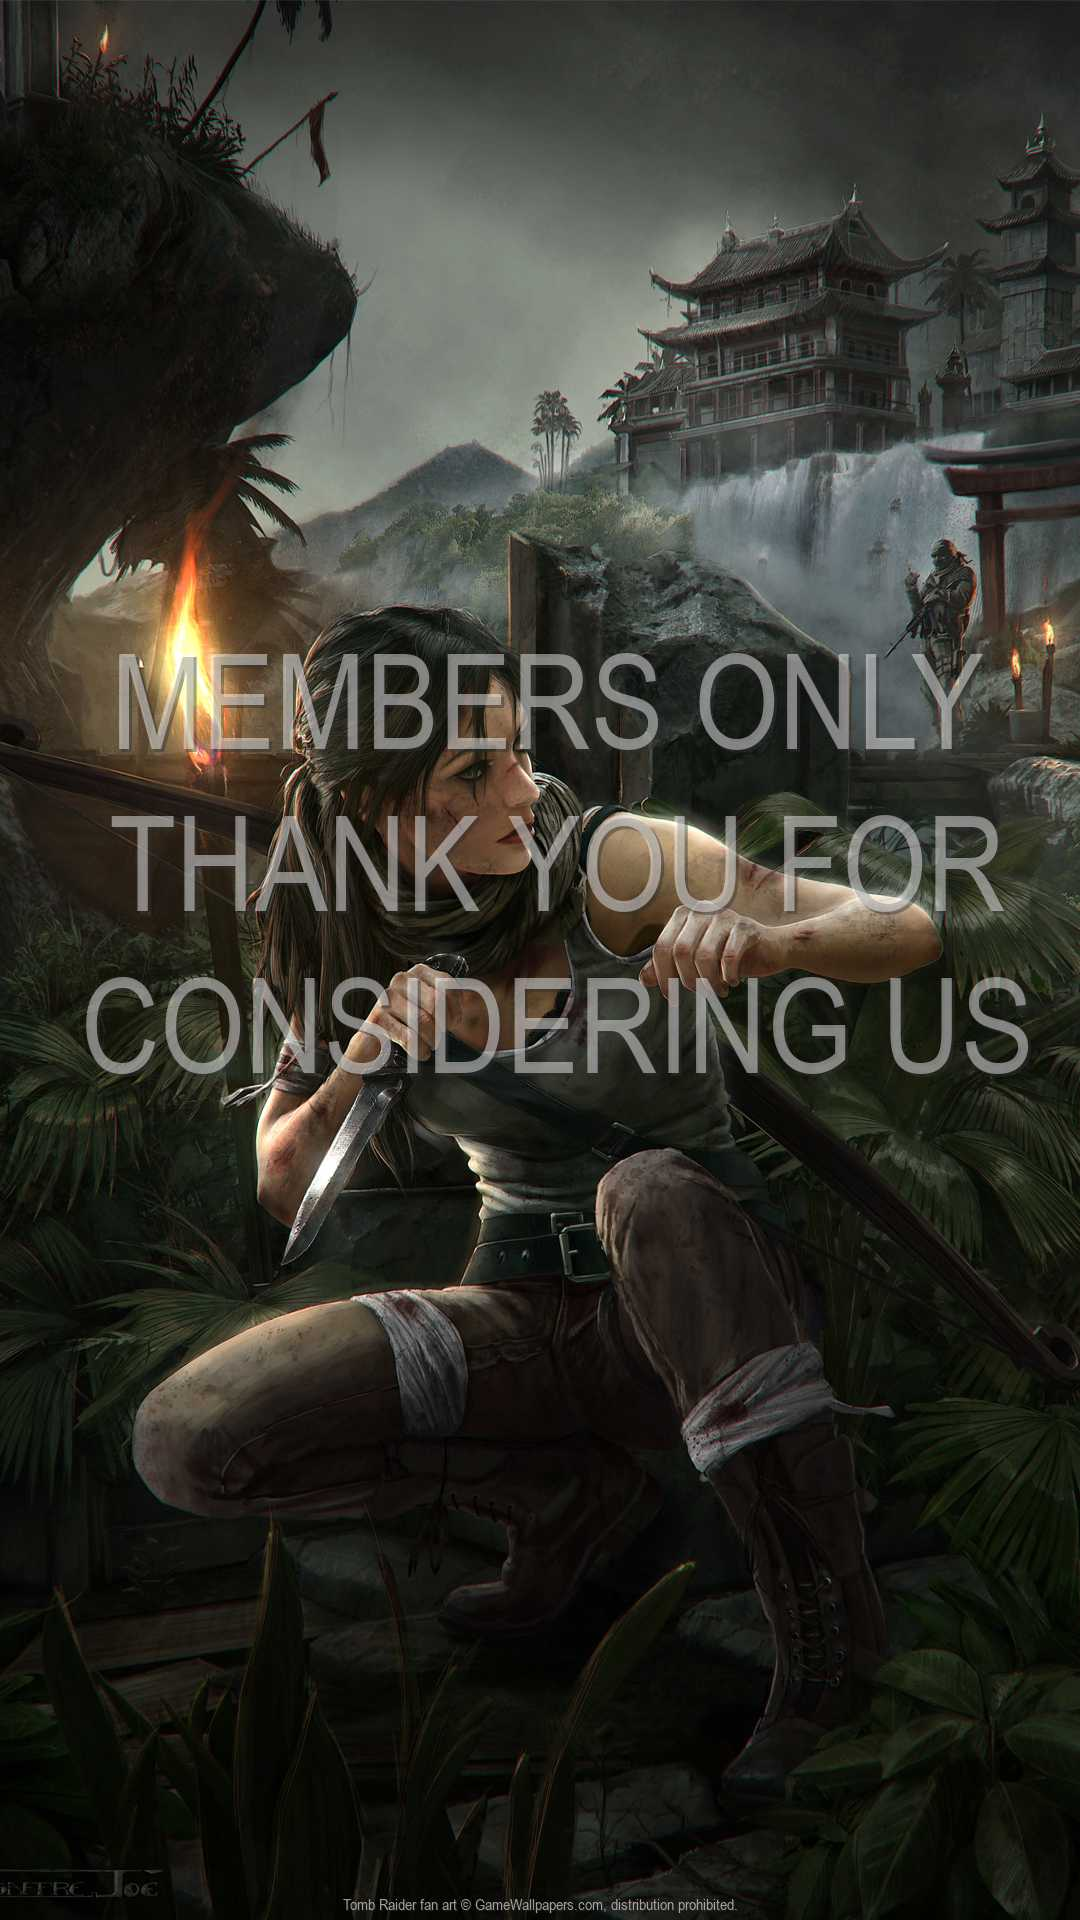 Tomb Raider fan art 1080p Vertical Handy Hintergrundbild 09